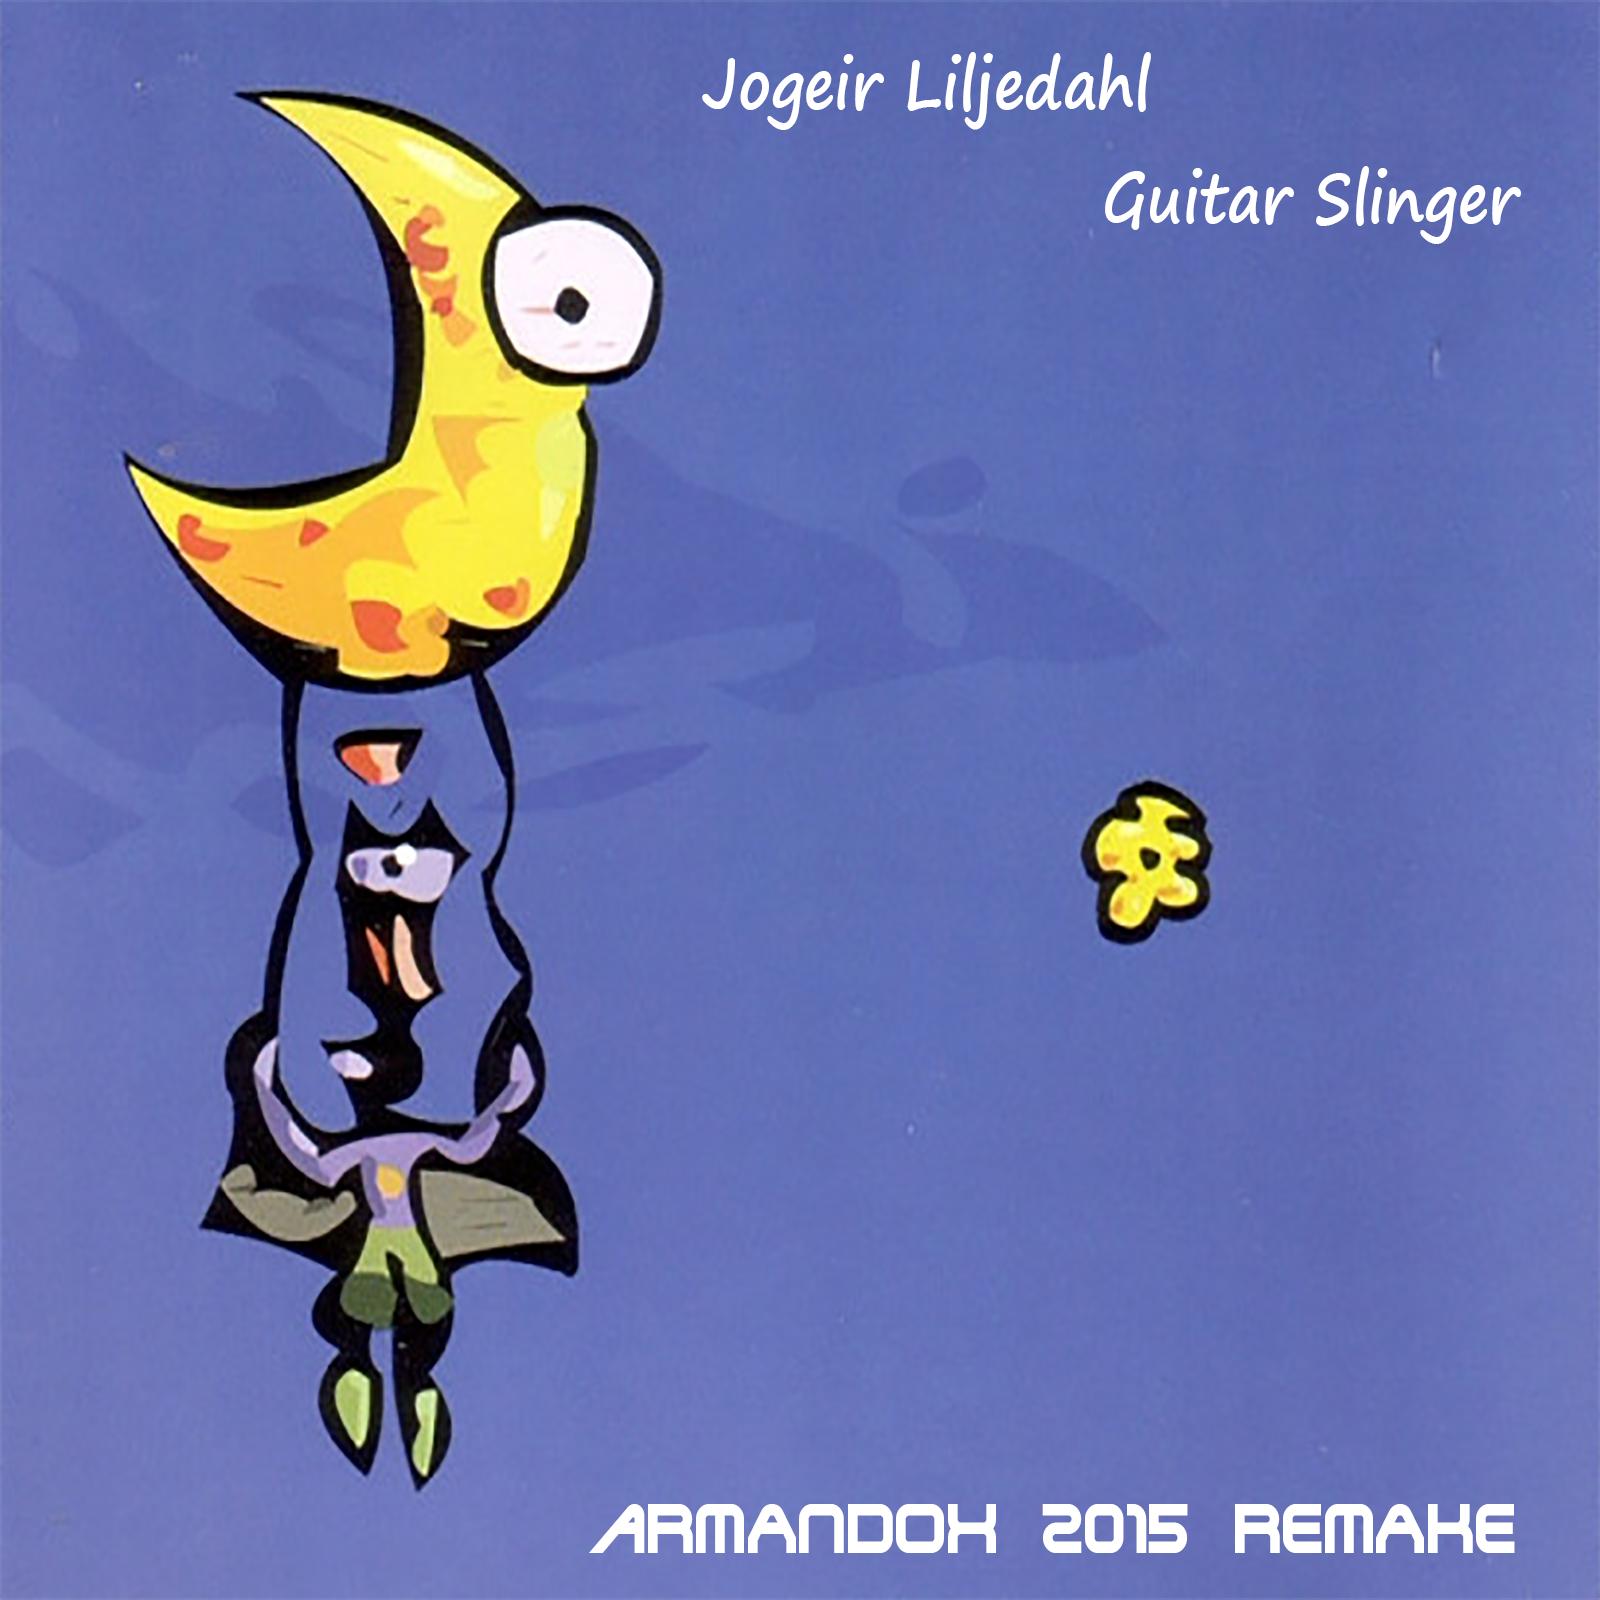 Jogeir Liljedahl - Guitar Slinger (Armandox 2015 Remake)